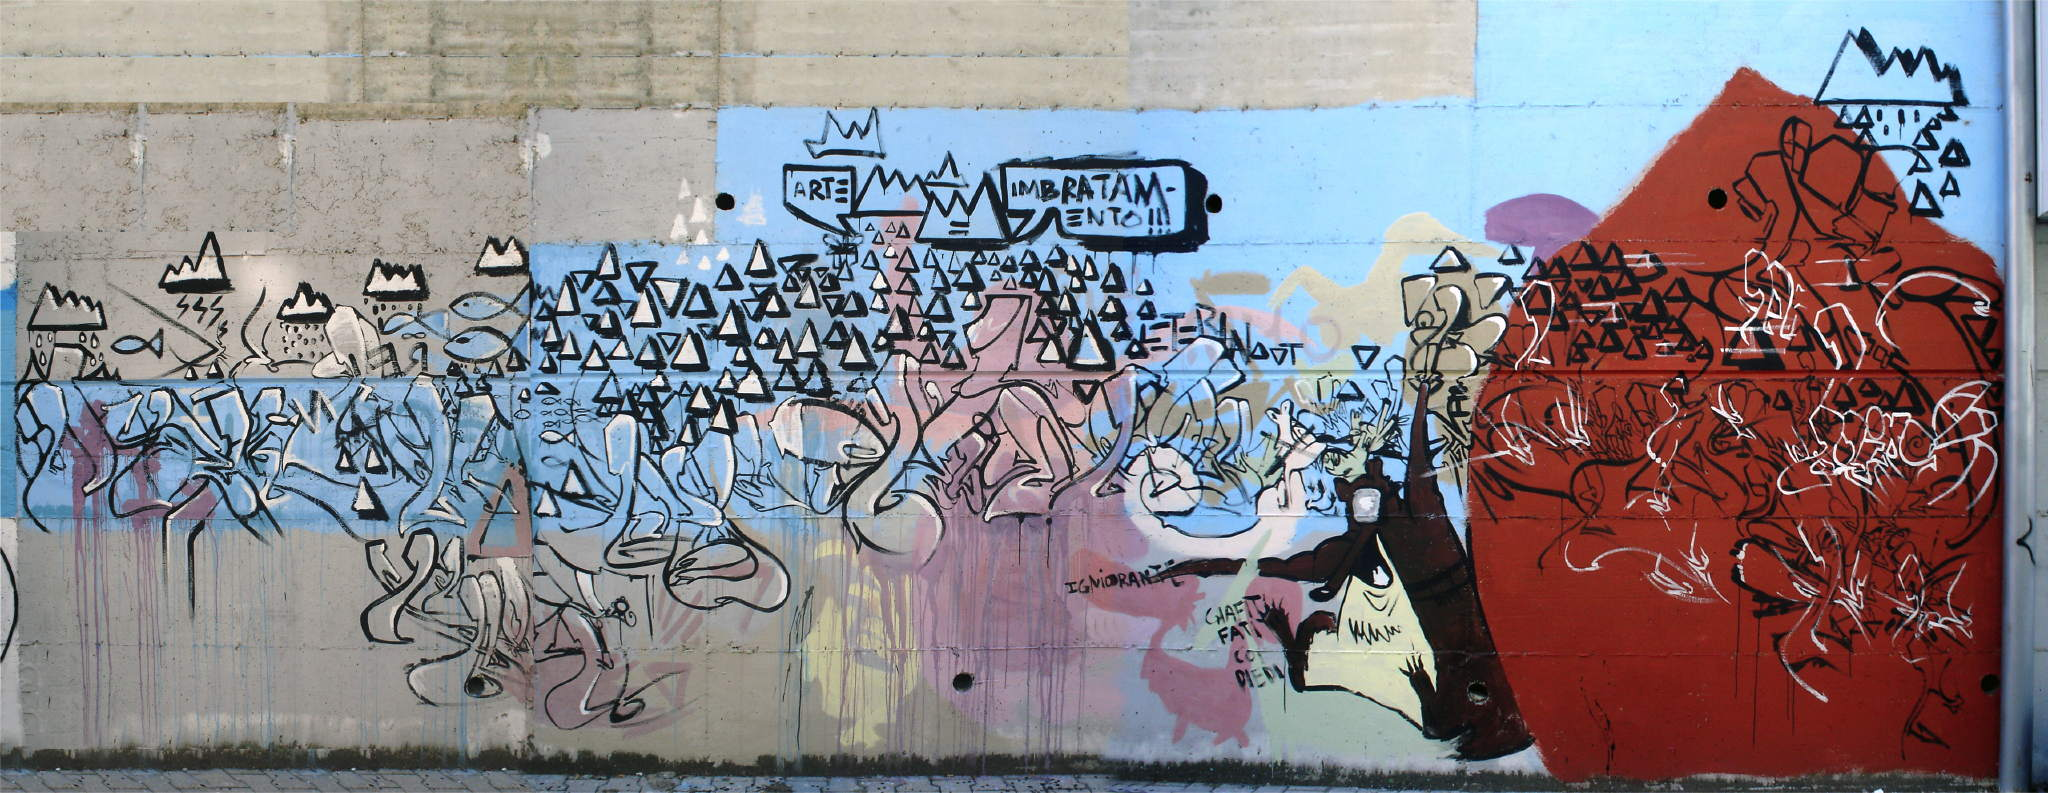 Art Crimes Italy 73